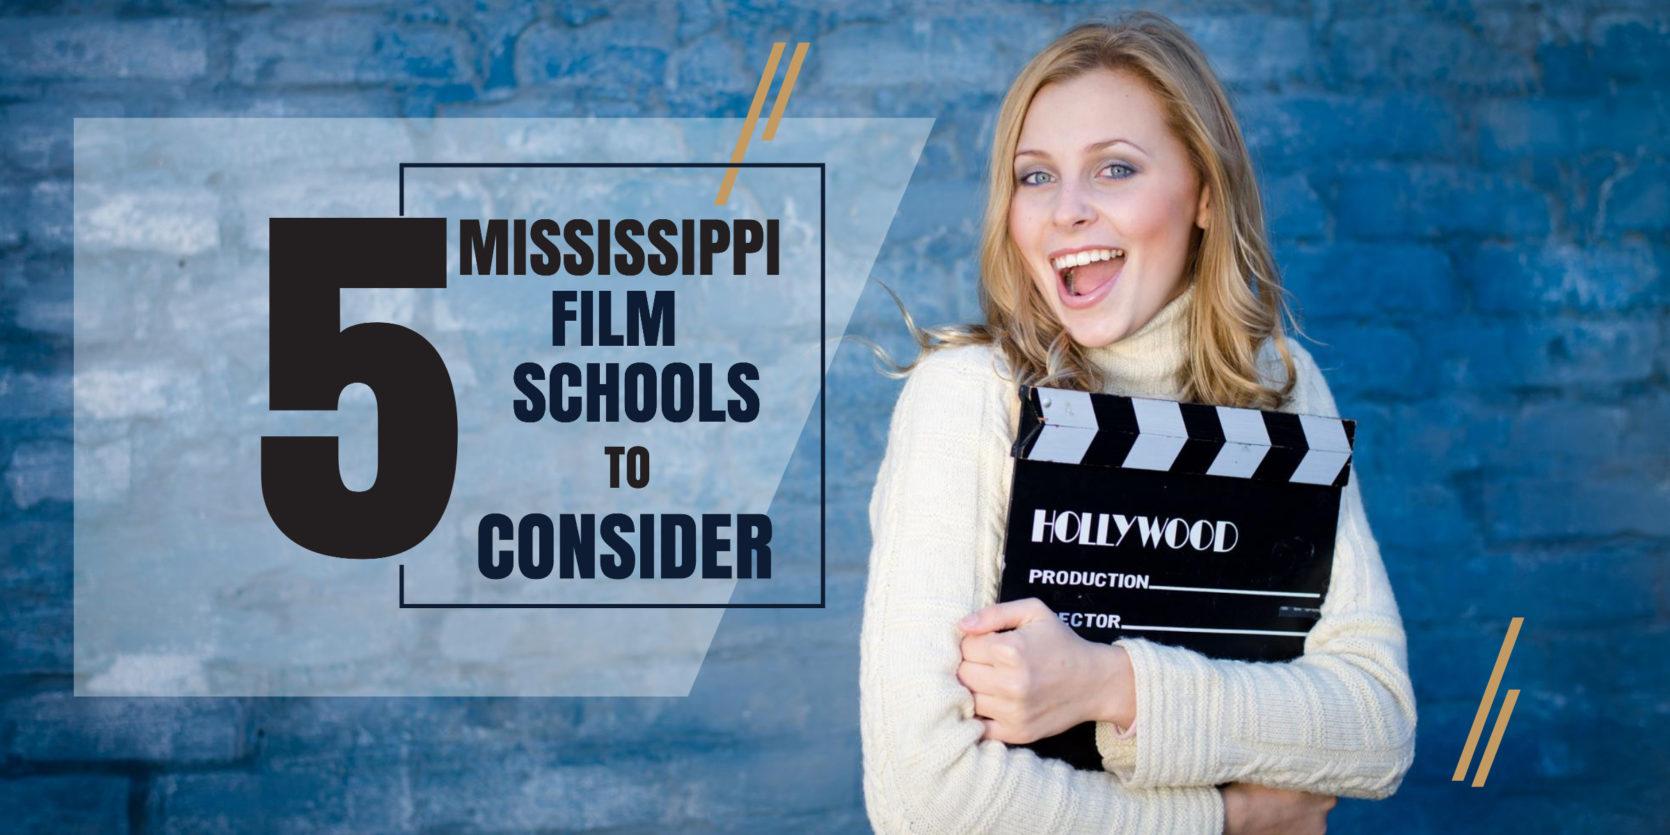 Top 5 Mississippi Film Schools